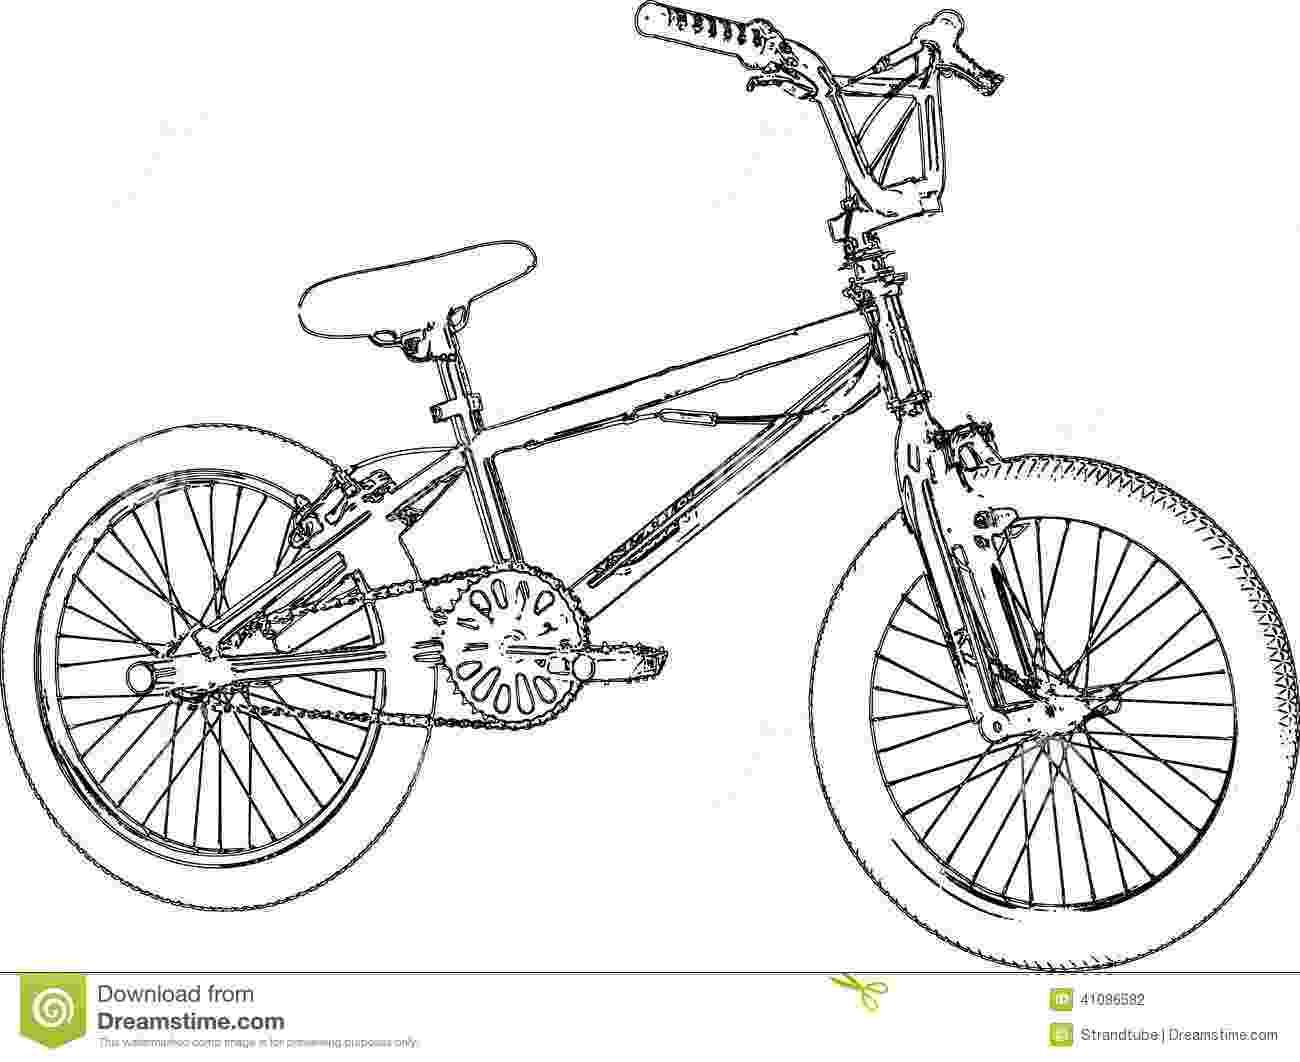 cycle sketch bmx sketch stock illustration illustration of kids cycle cycle sketch